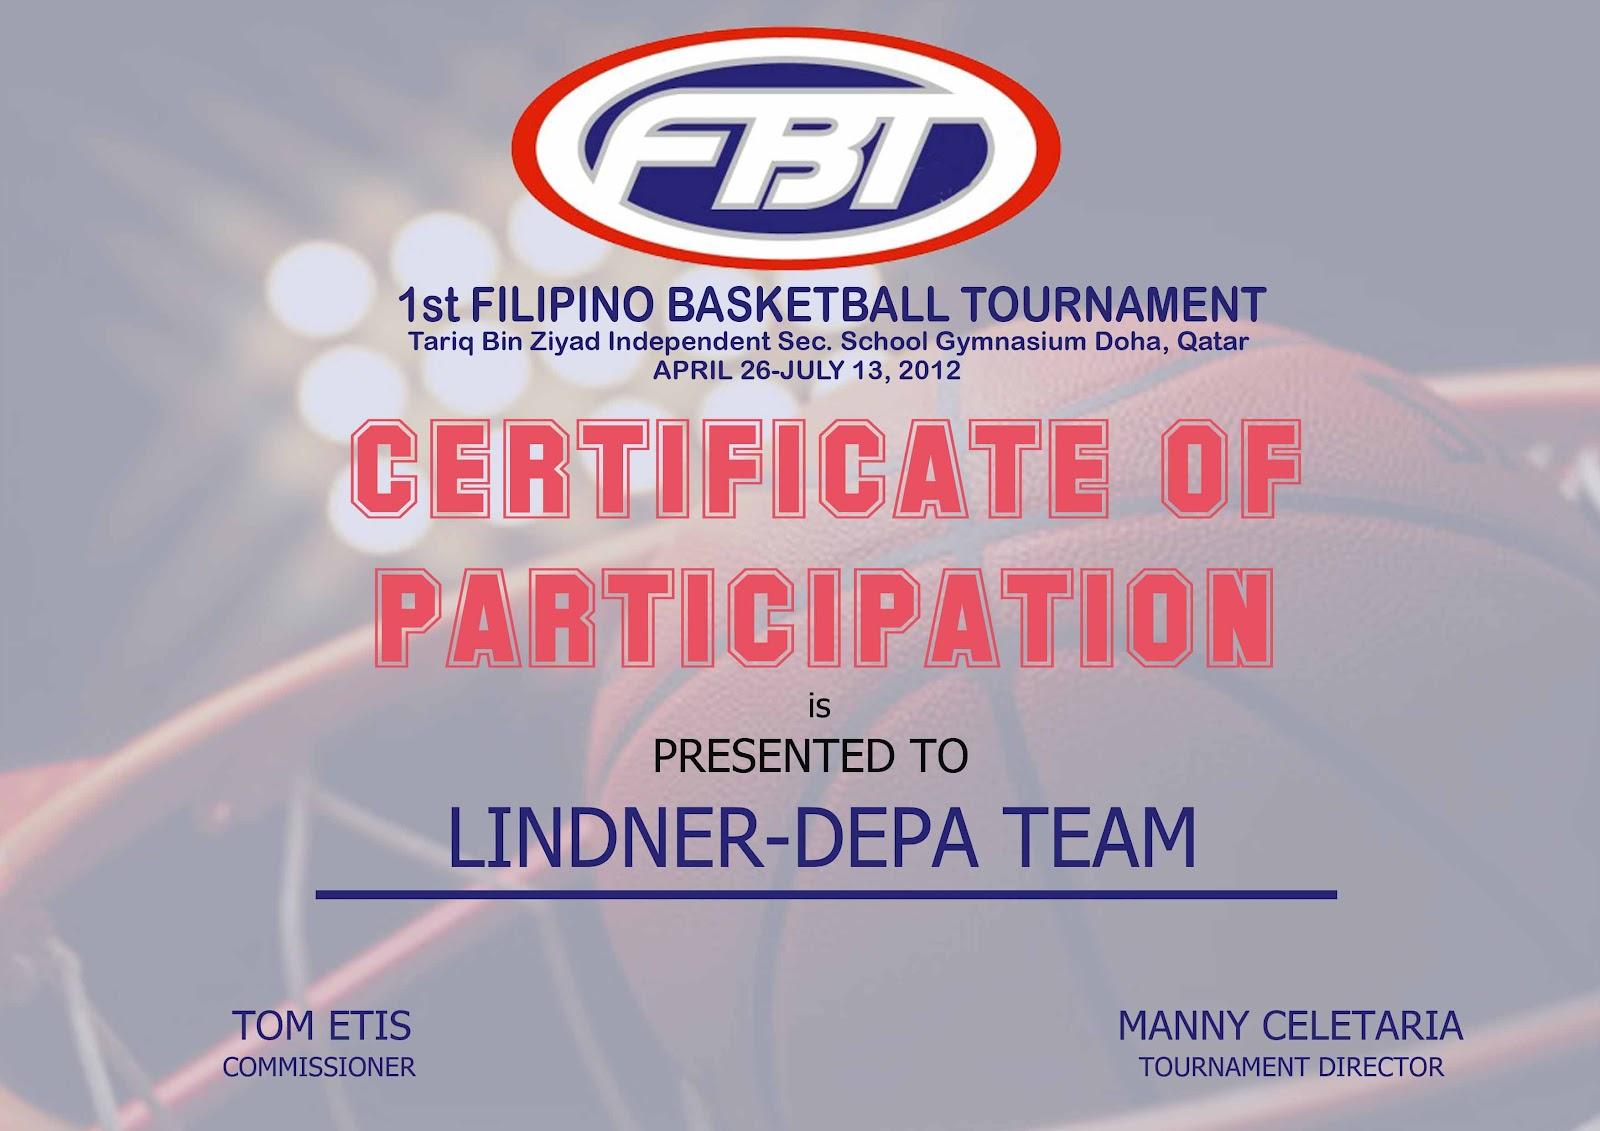 Basketball tournament certificate template image collections filipino basketball tournament certificate of participation all certificate of participation all teams posted by filipino basketball xflitez Choice Image